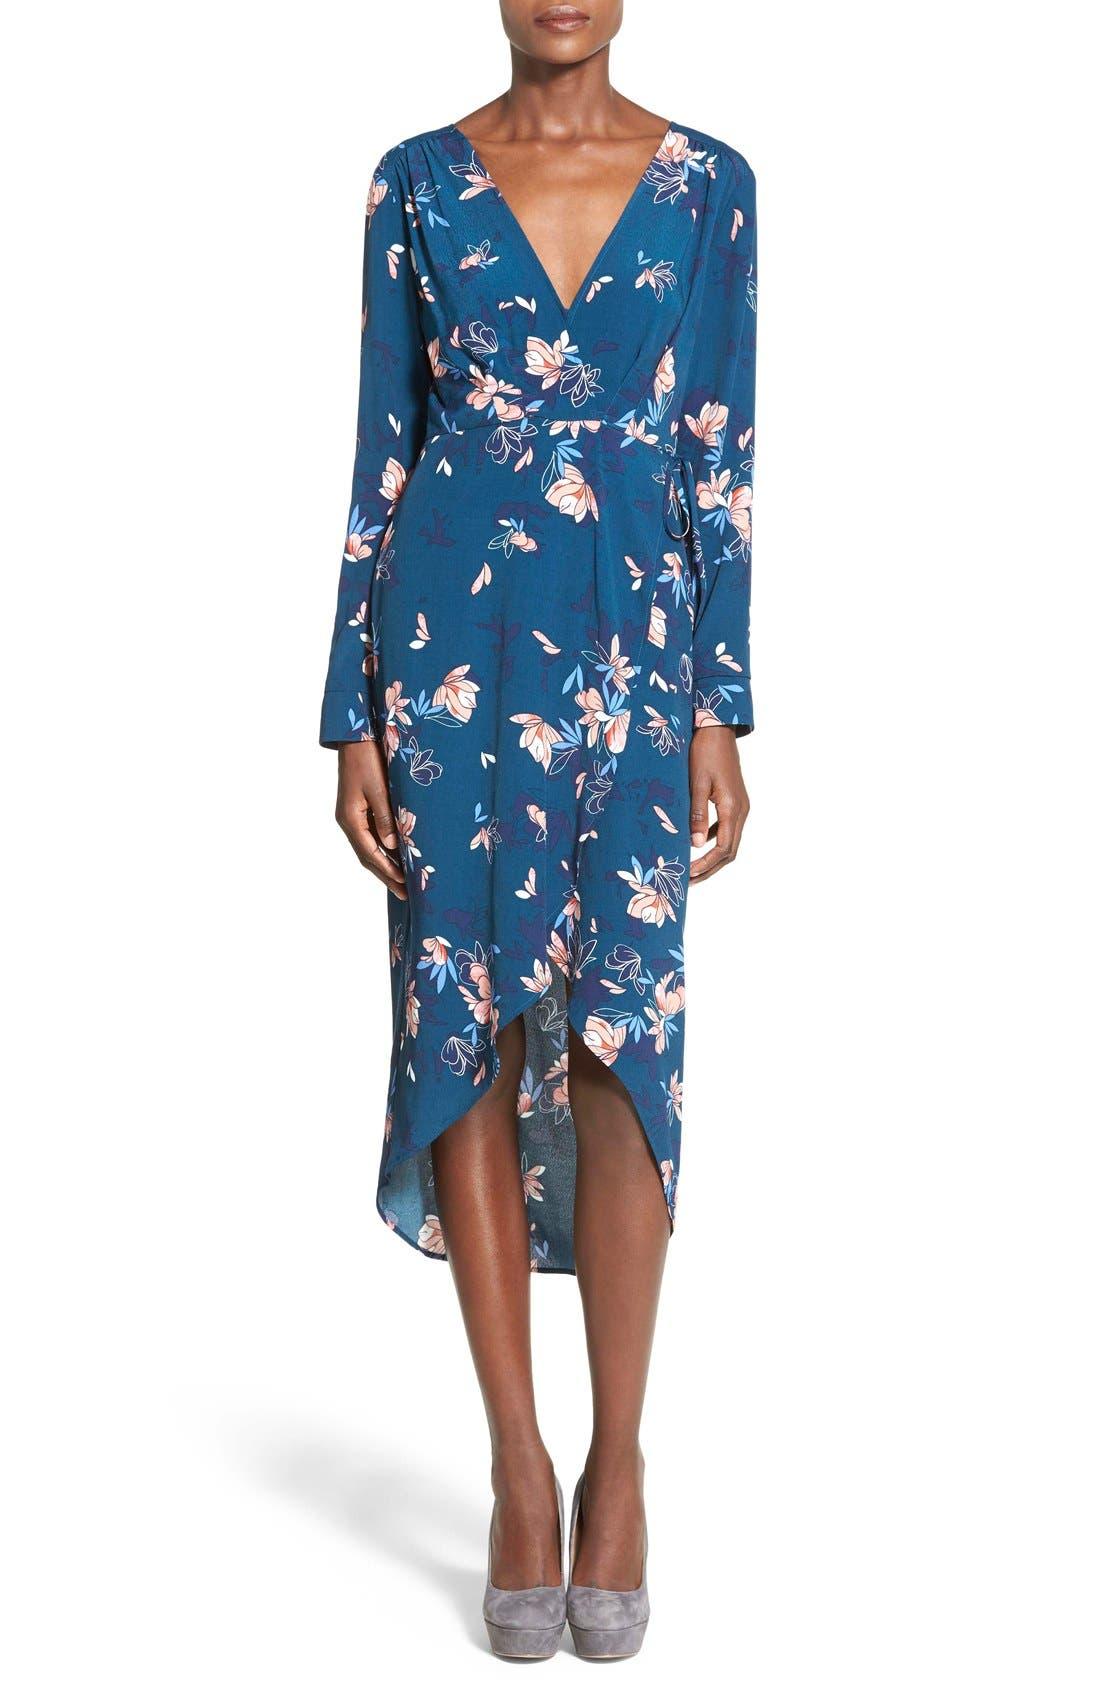 ASTR Wrap Front High/Low Dress,                             Main thumbnail 1, color,                             Teal Multi Floral